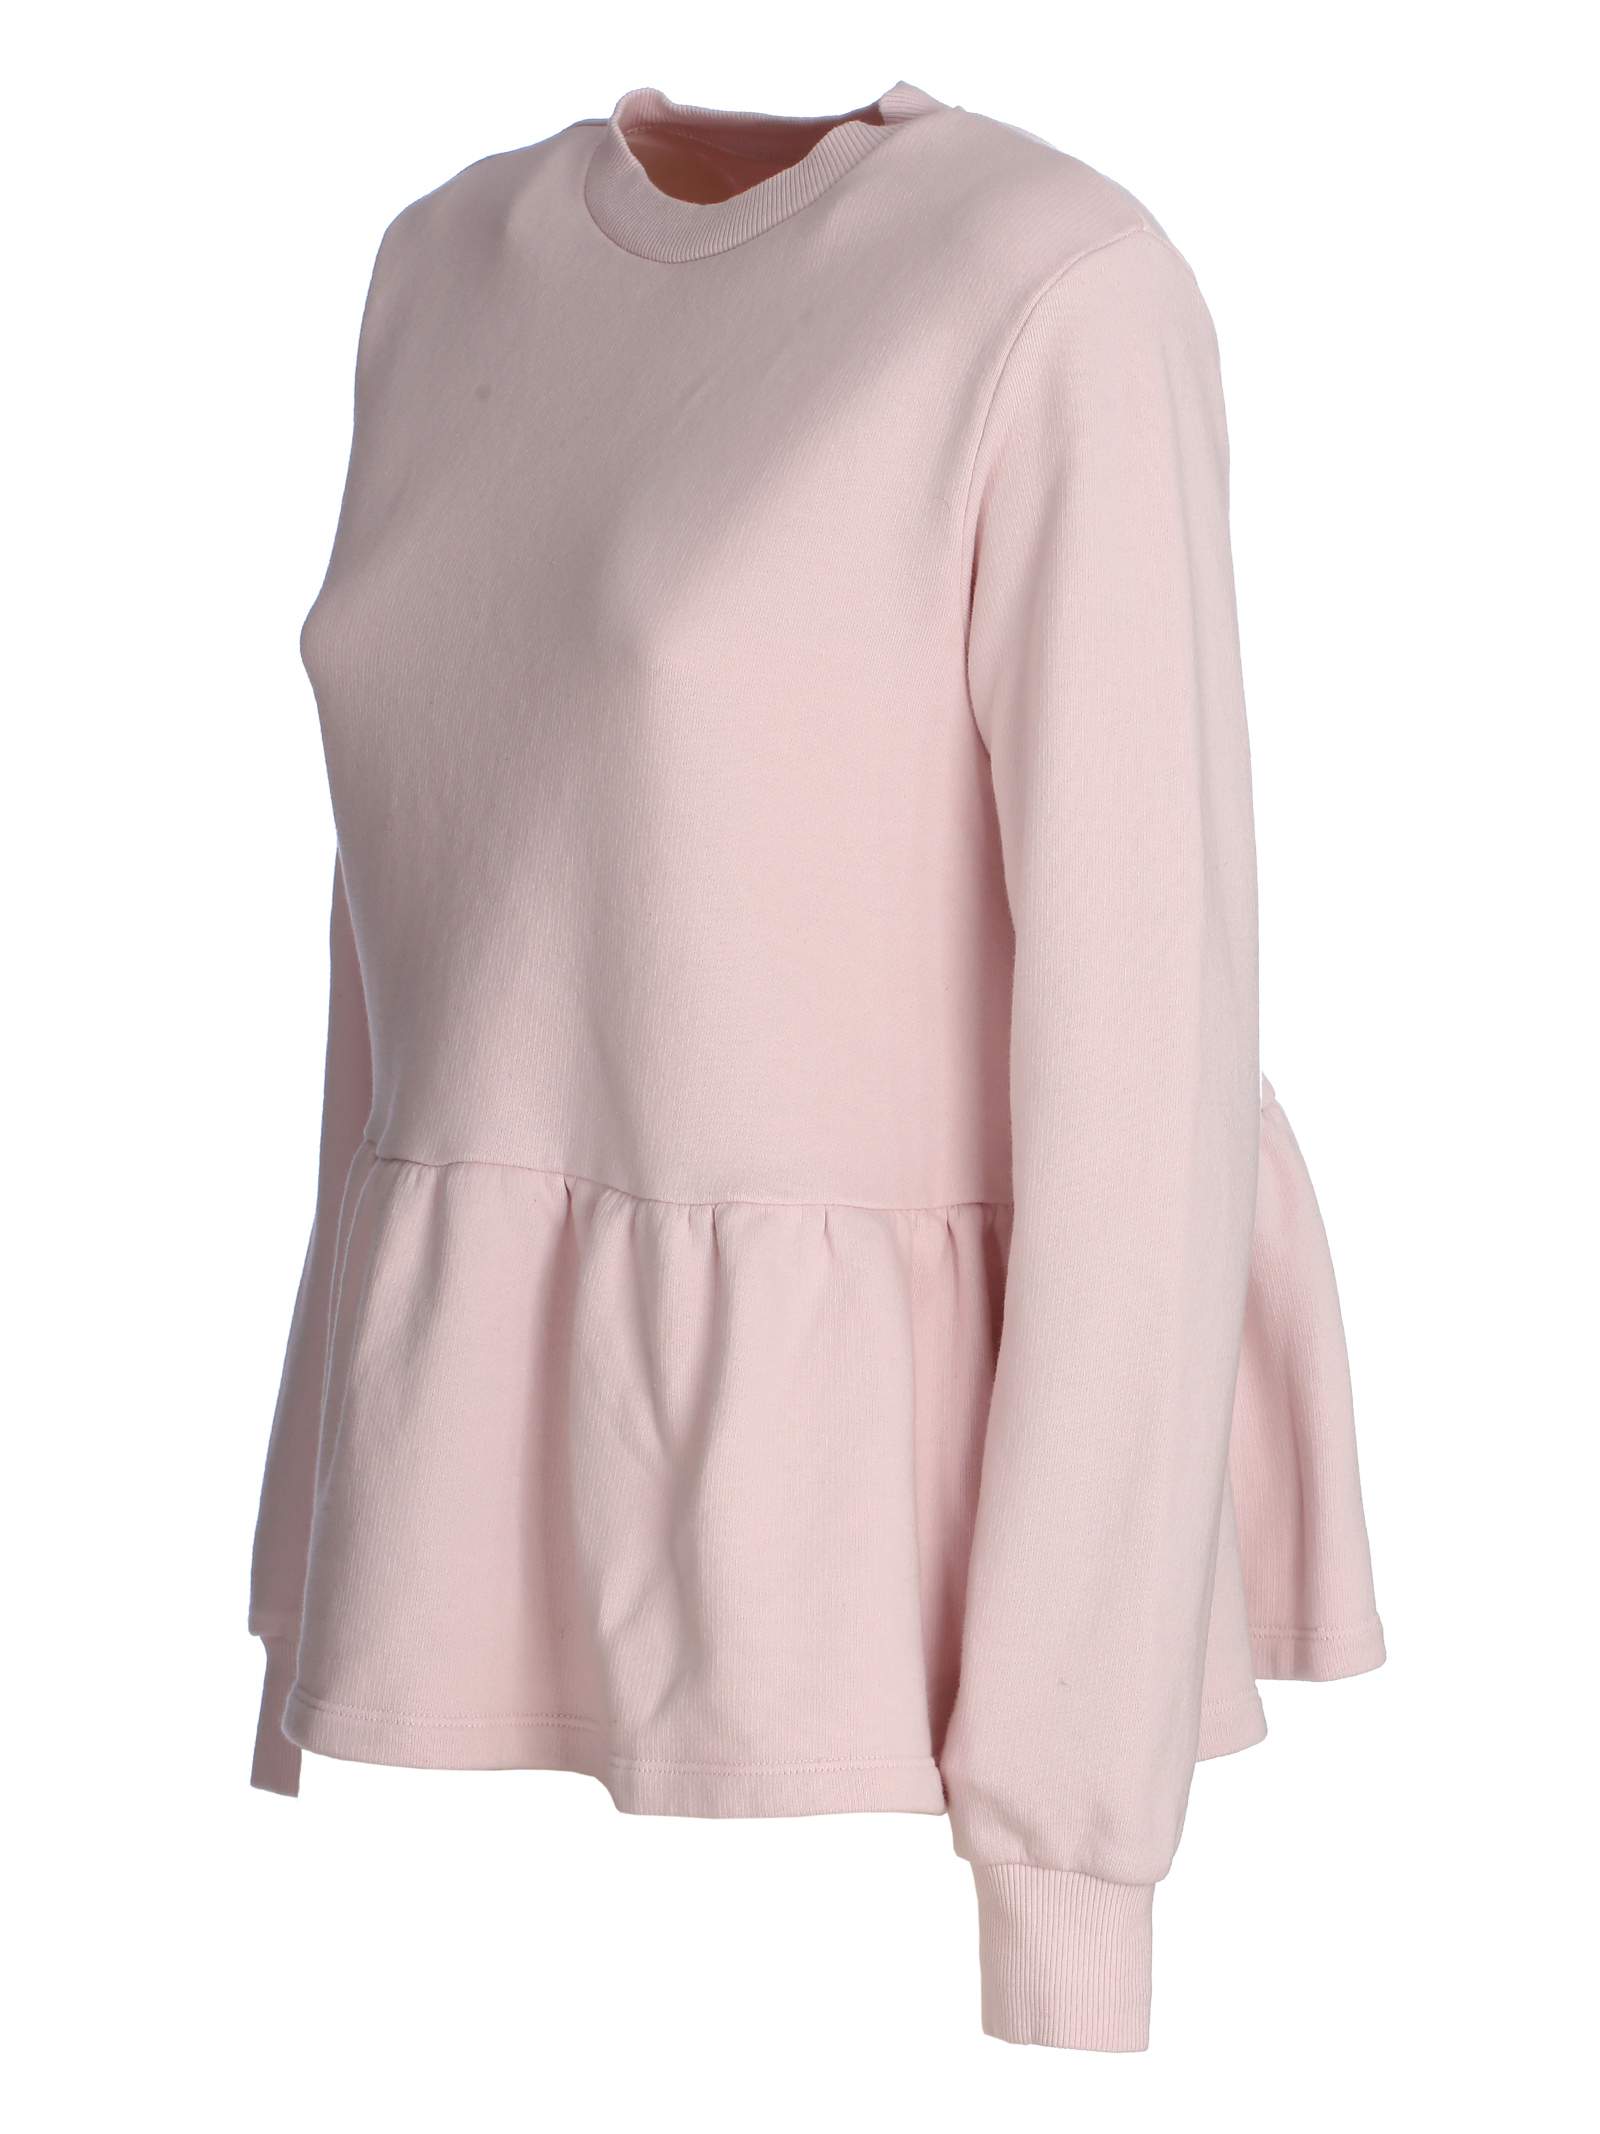 BEATRICE PINK COTTON SWEATSHIRT DOU DOU   Sweatshirts   20SMDDFW000027027